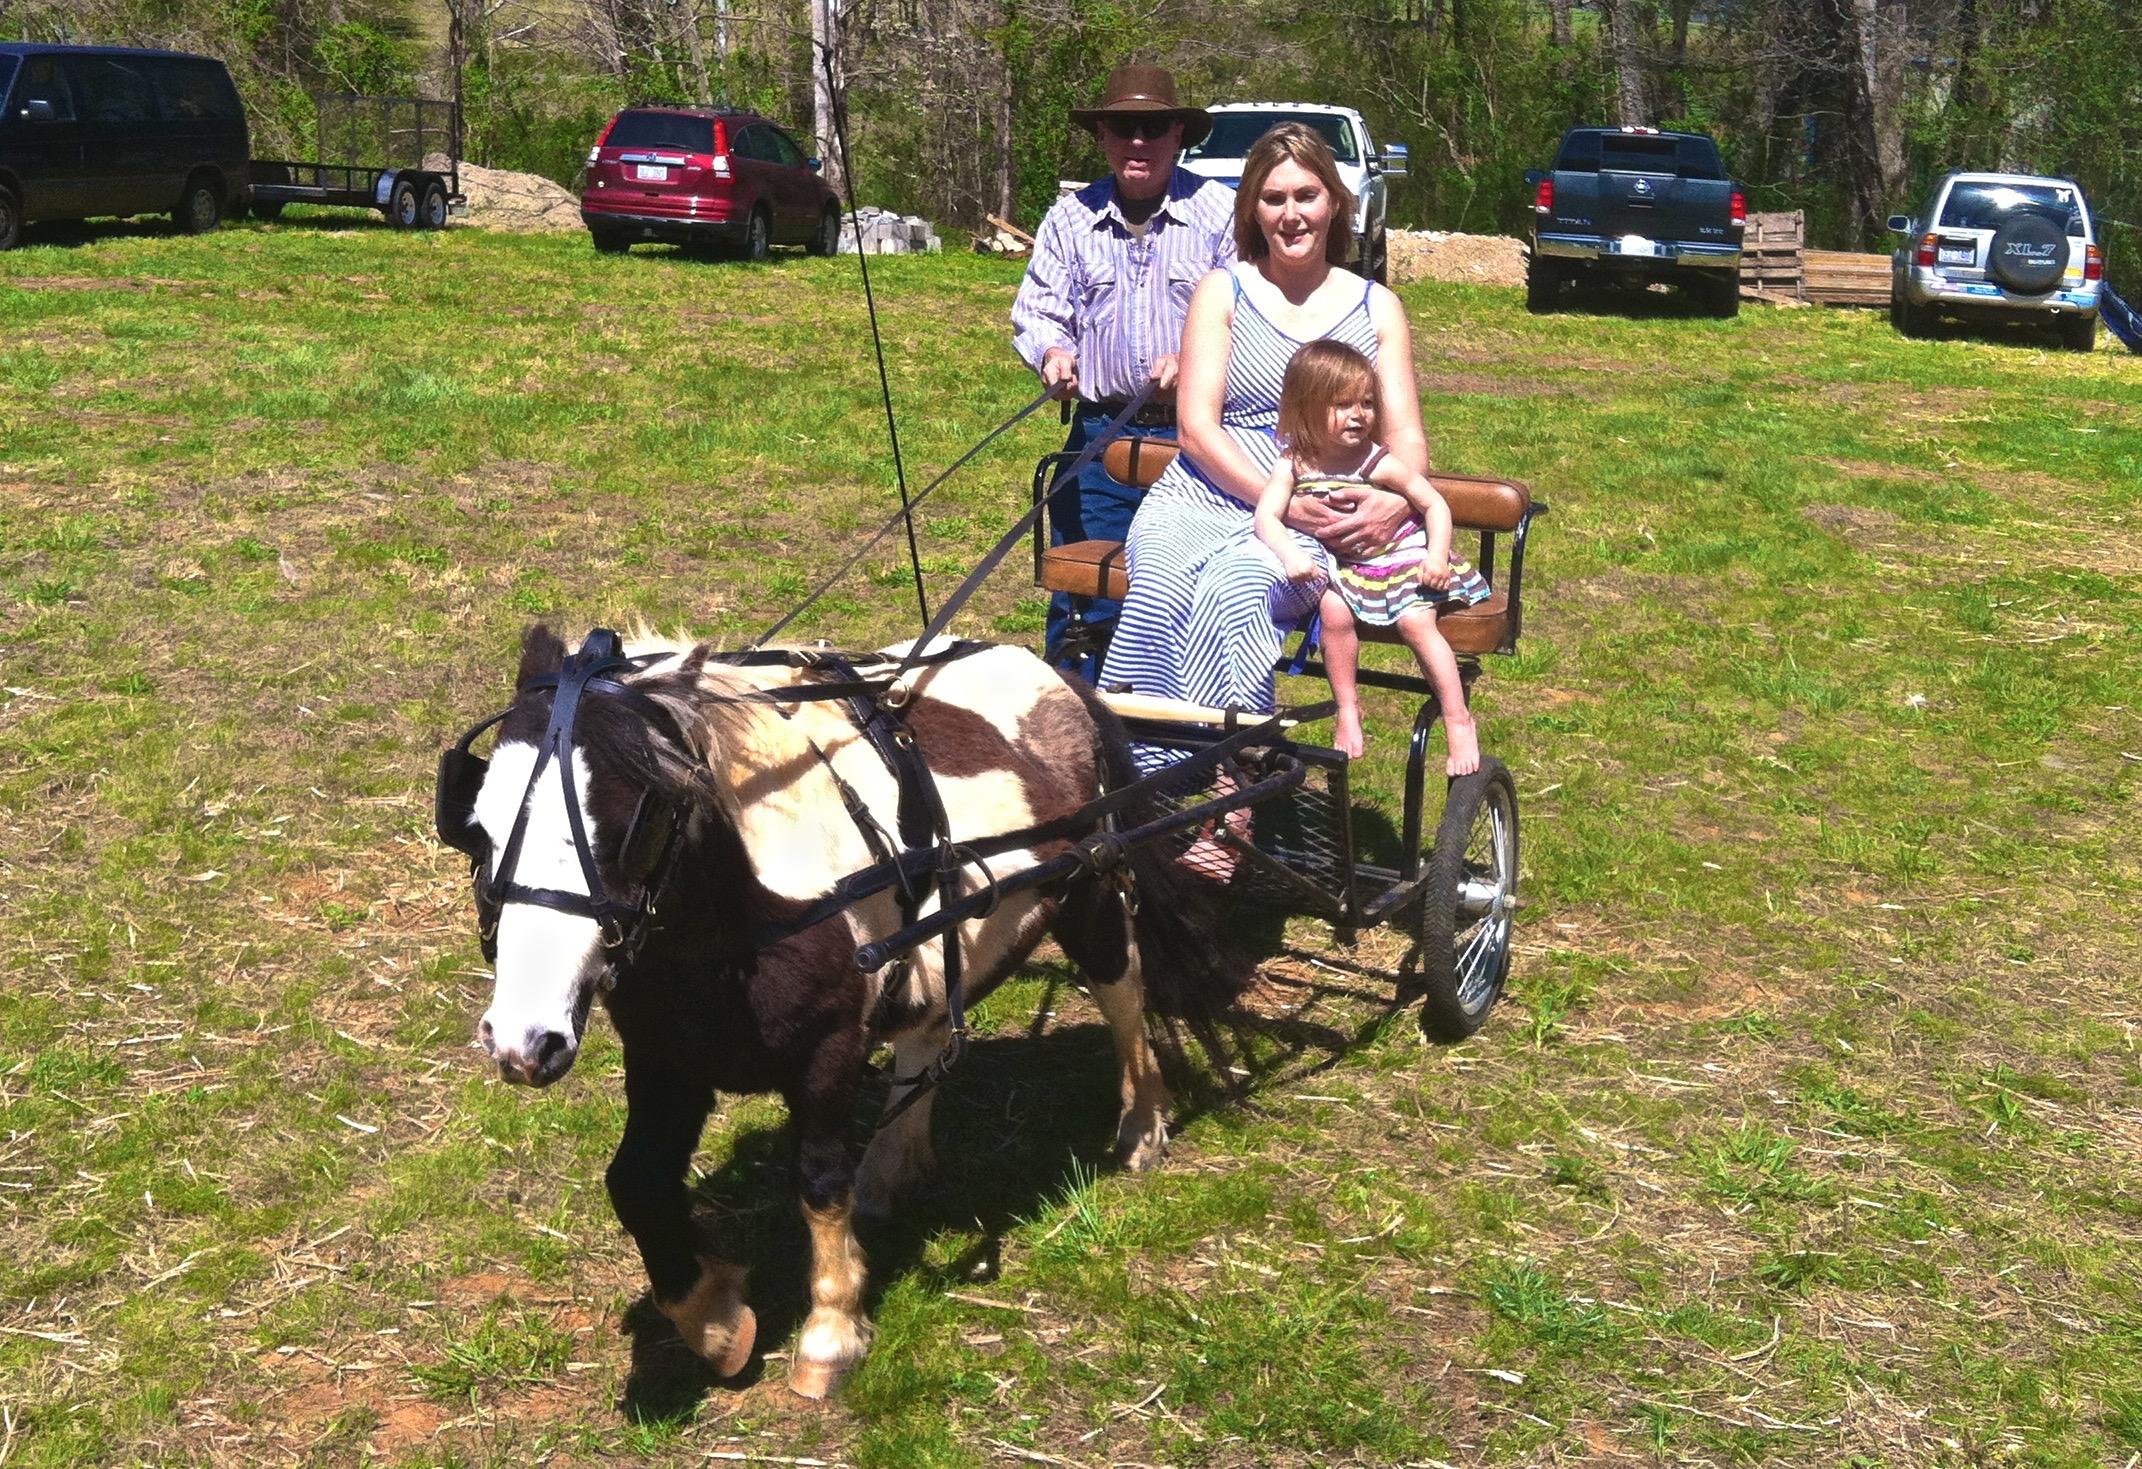 Miniature pony carriage rides